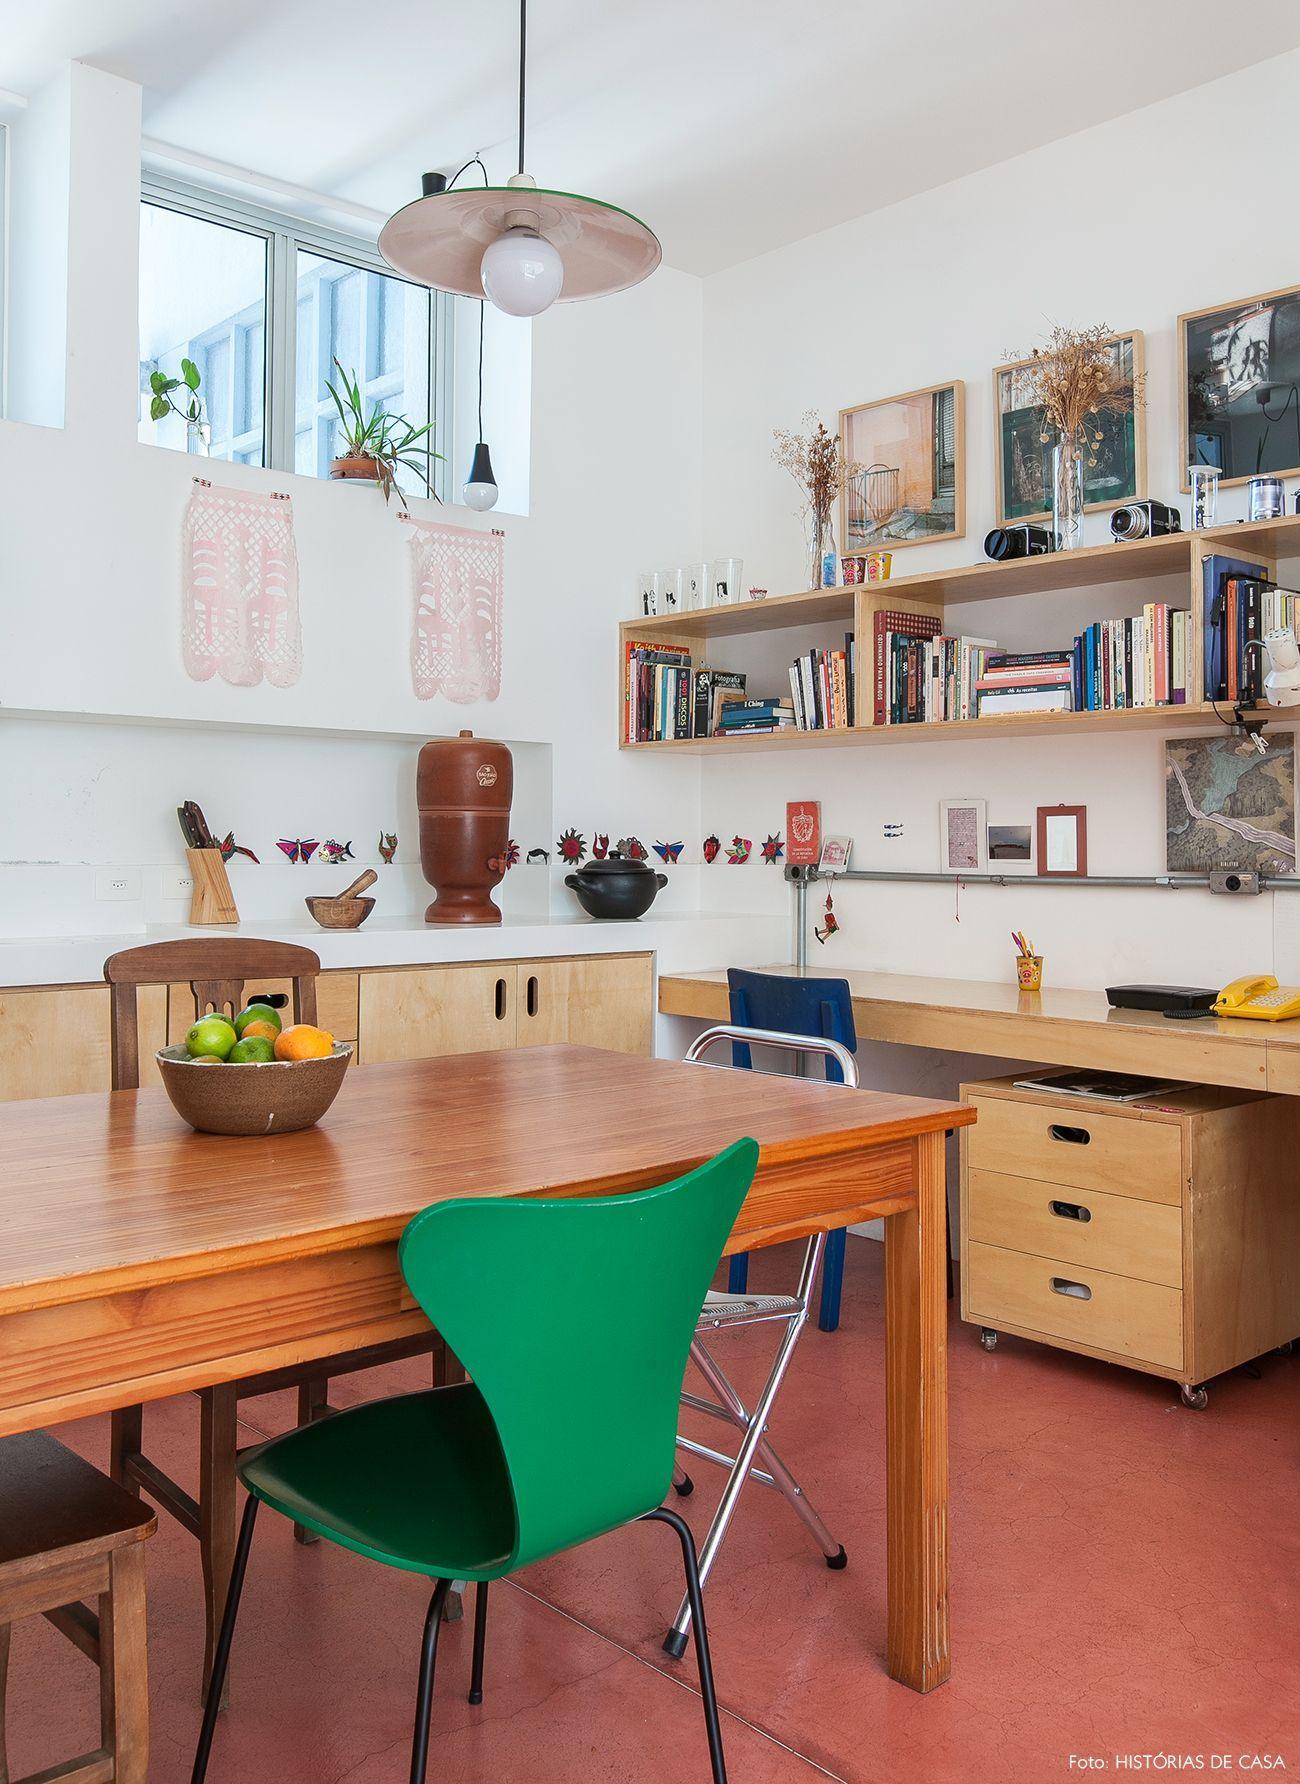 Inspiring 28 Cozy Small Apartment Interior